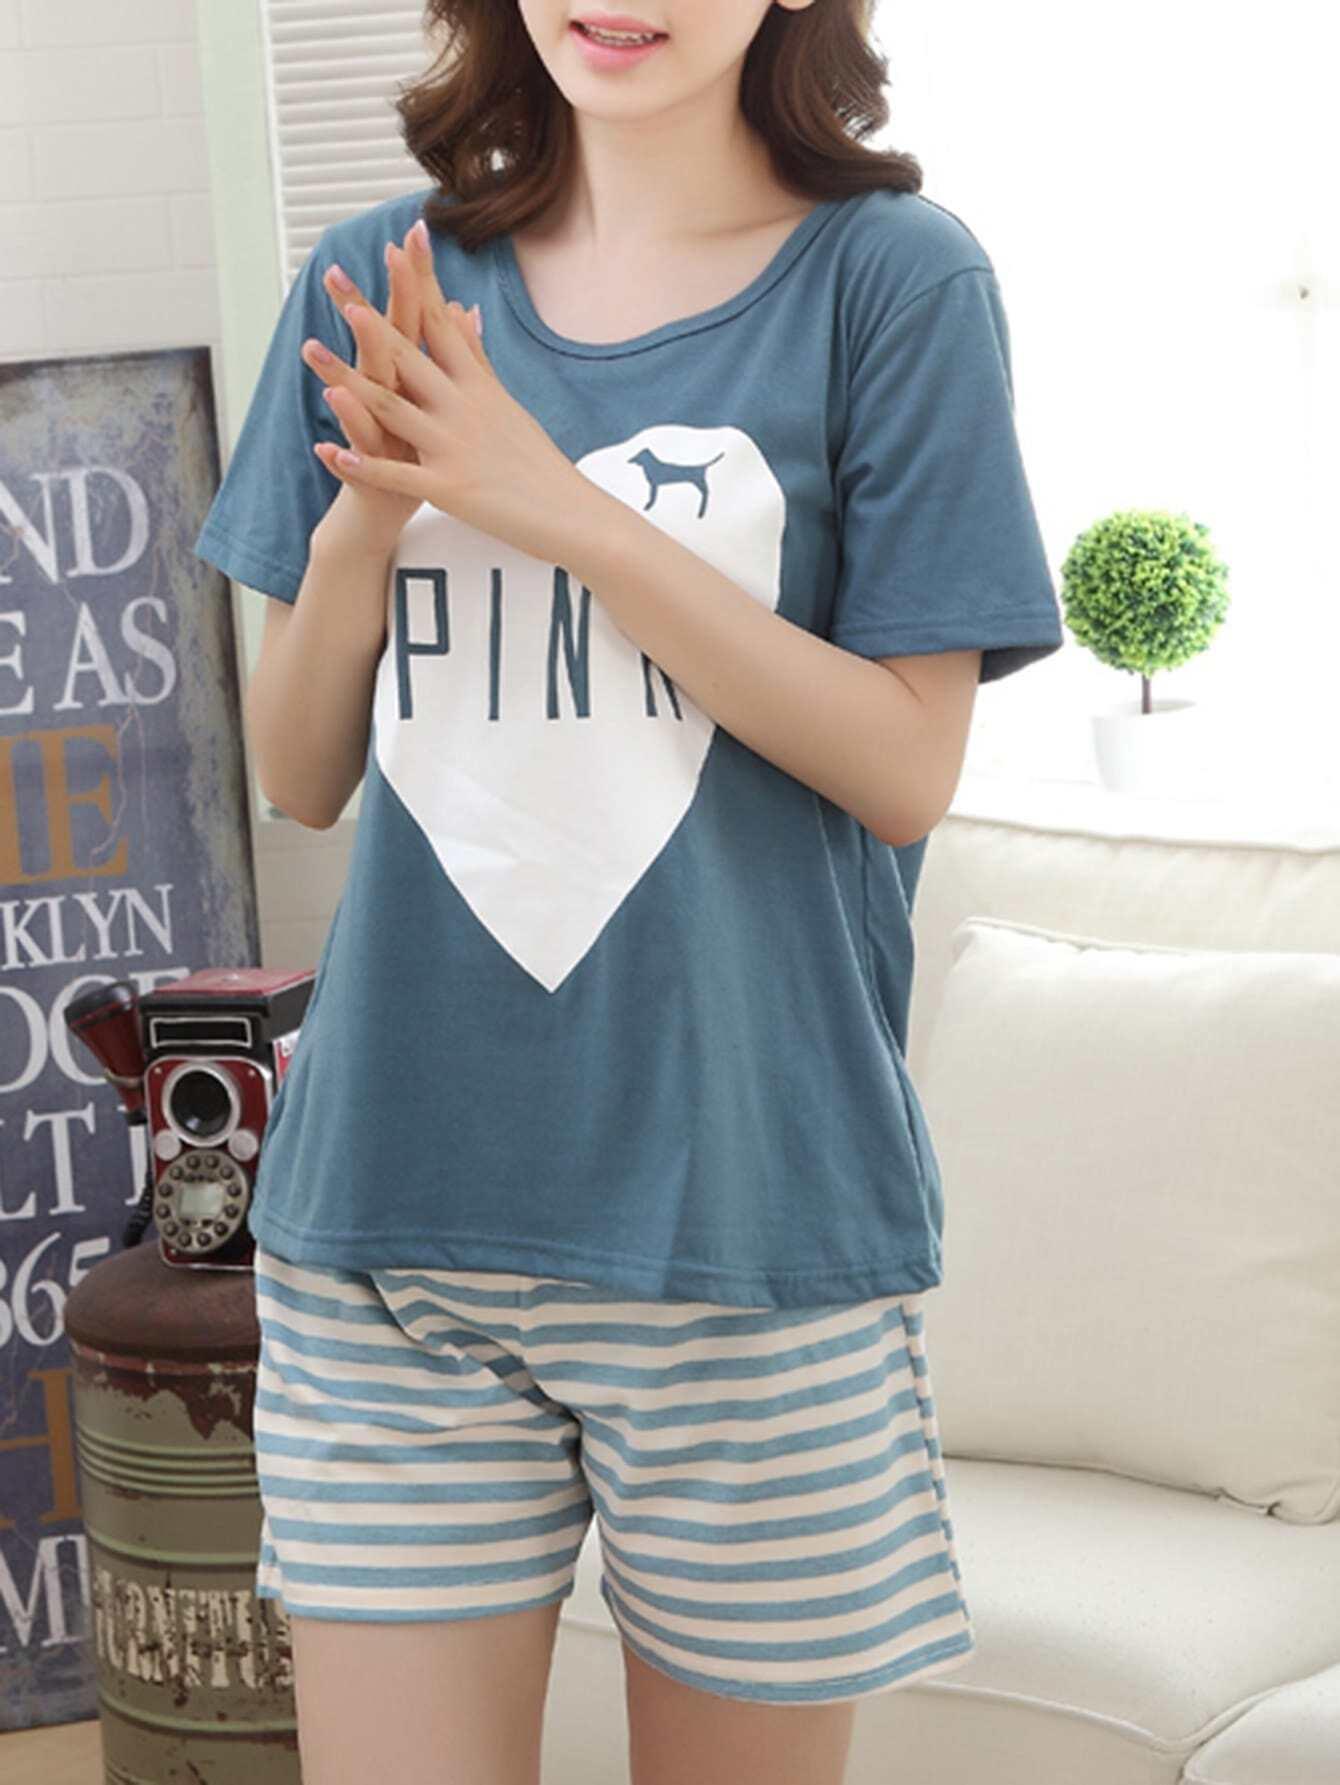 Heart Print Tee & Striped Shorts PJ Set heart print tee and striped shorts pajama set